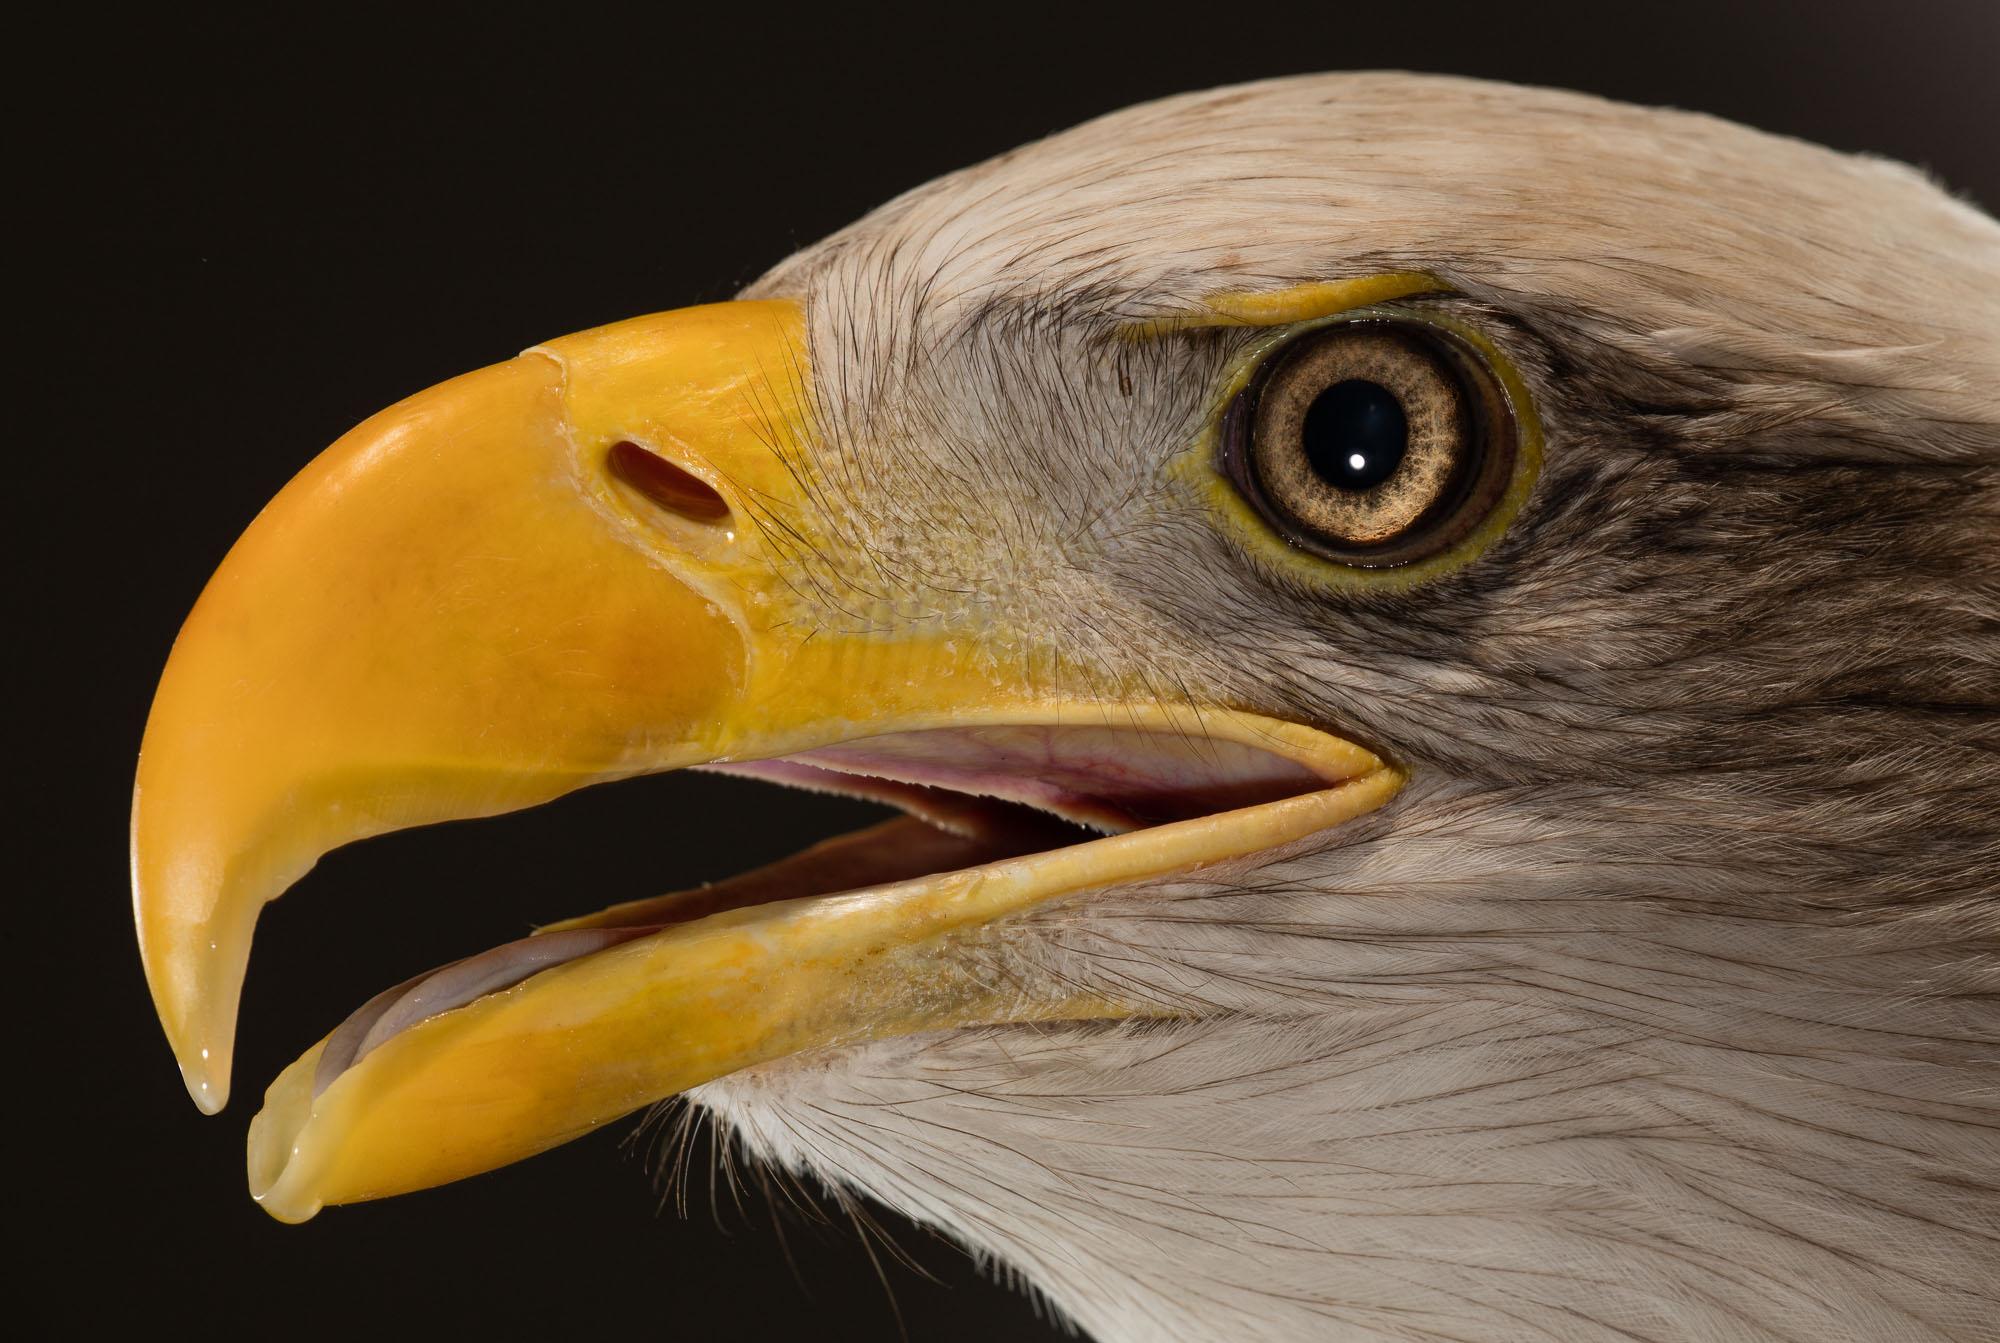 Tim Platt - Bird of Prey with yellow beak